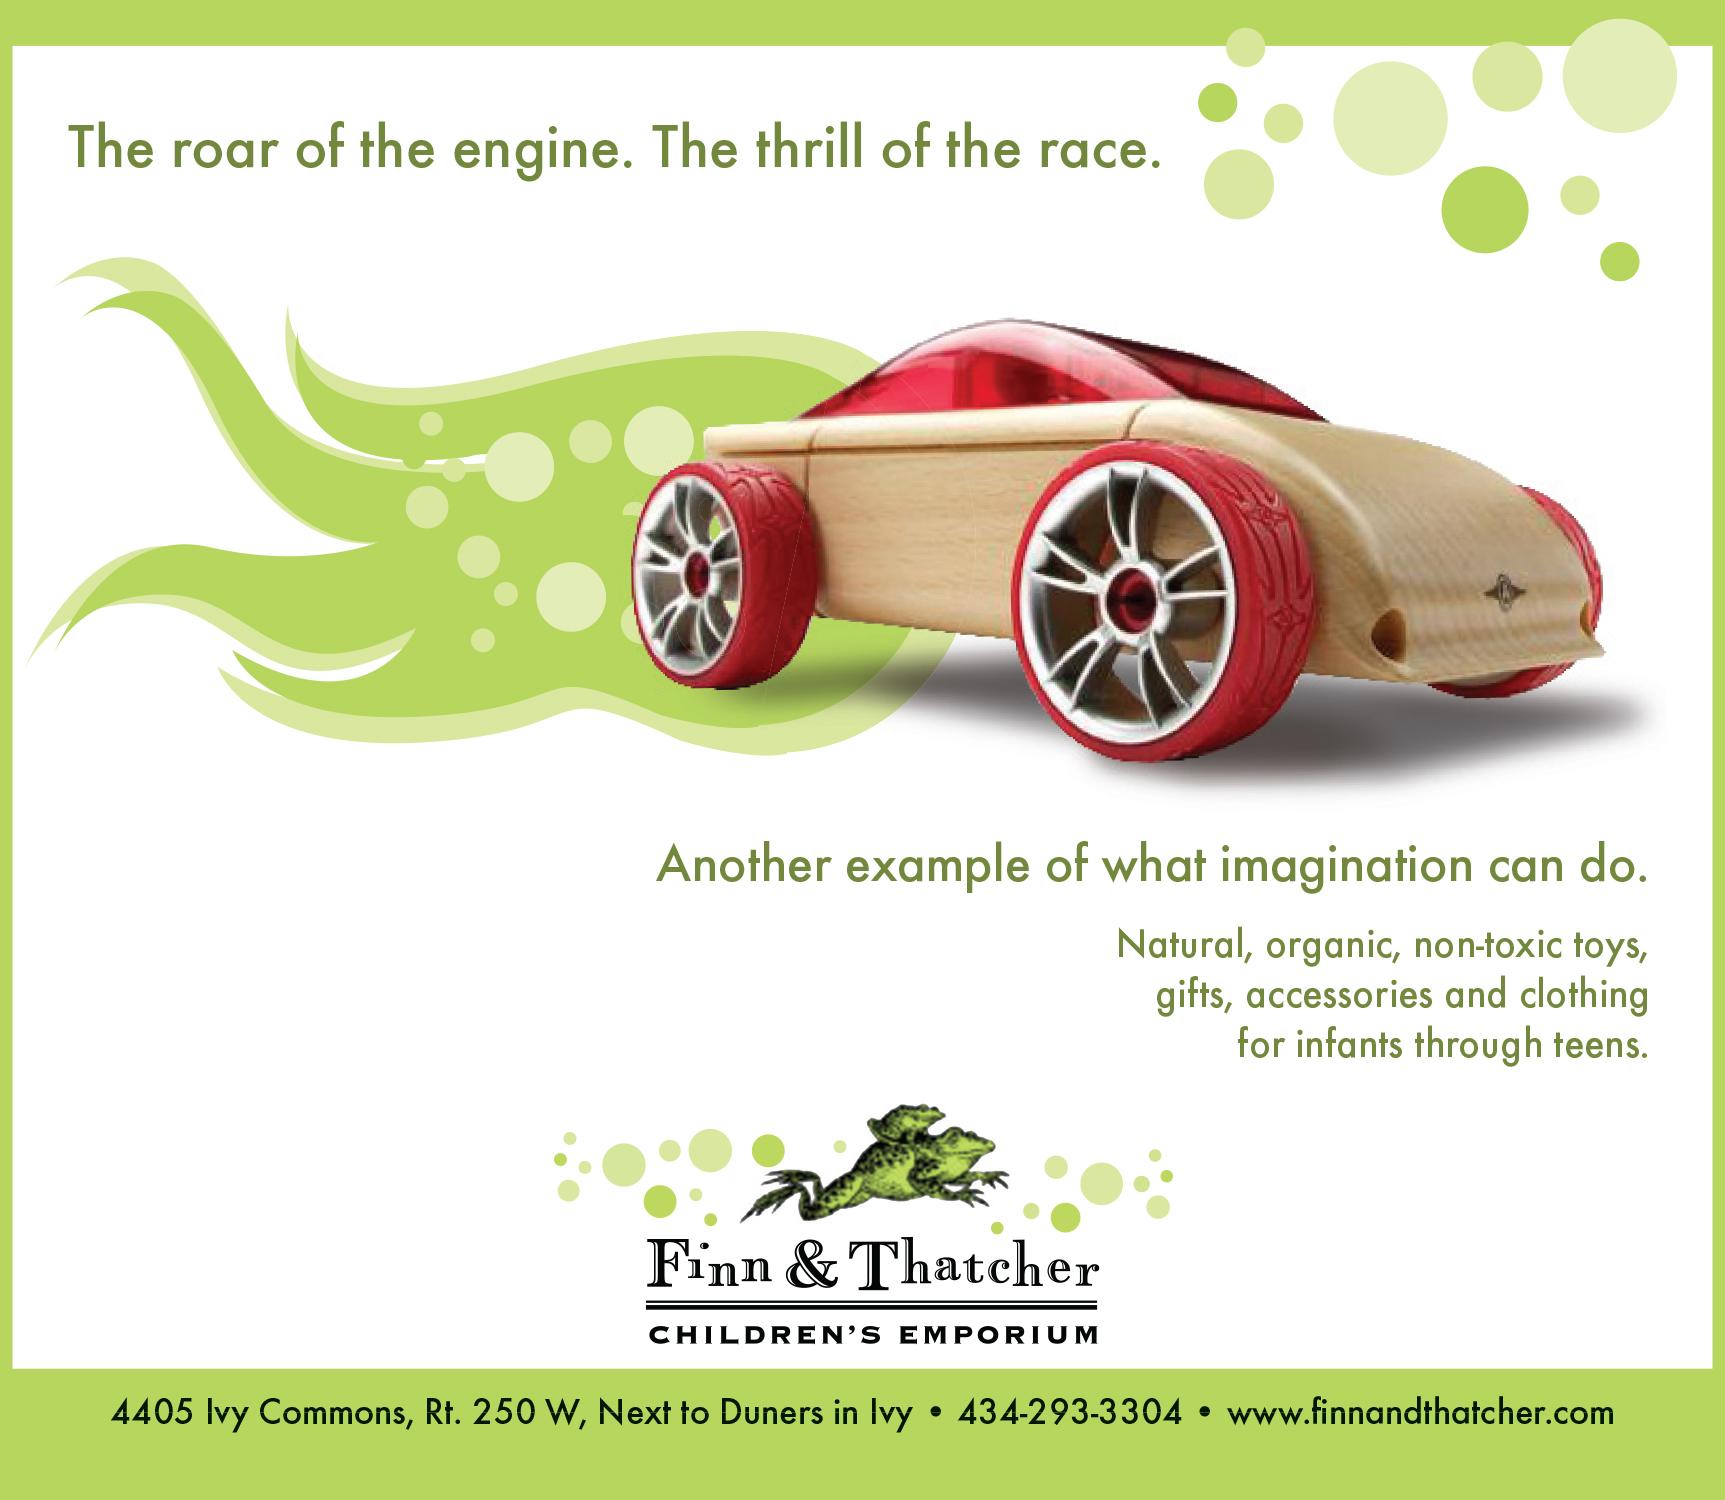 Newspaper Ad - Finn & Thatcher: Thrill Of The Race